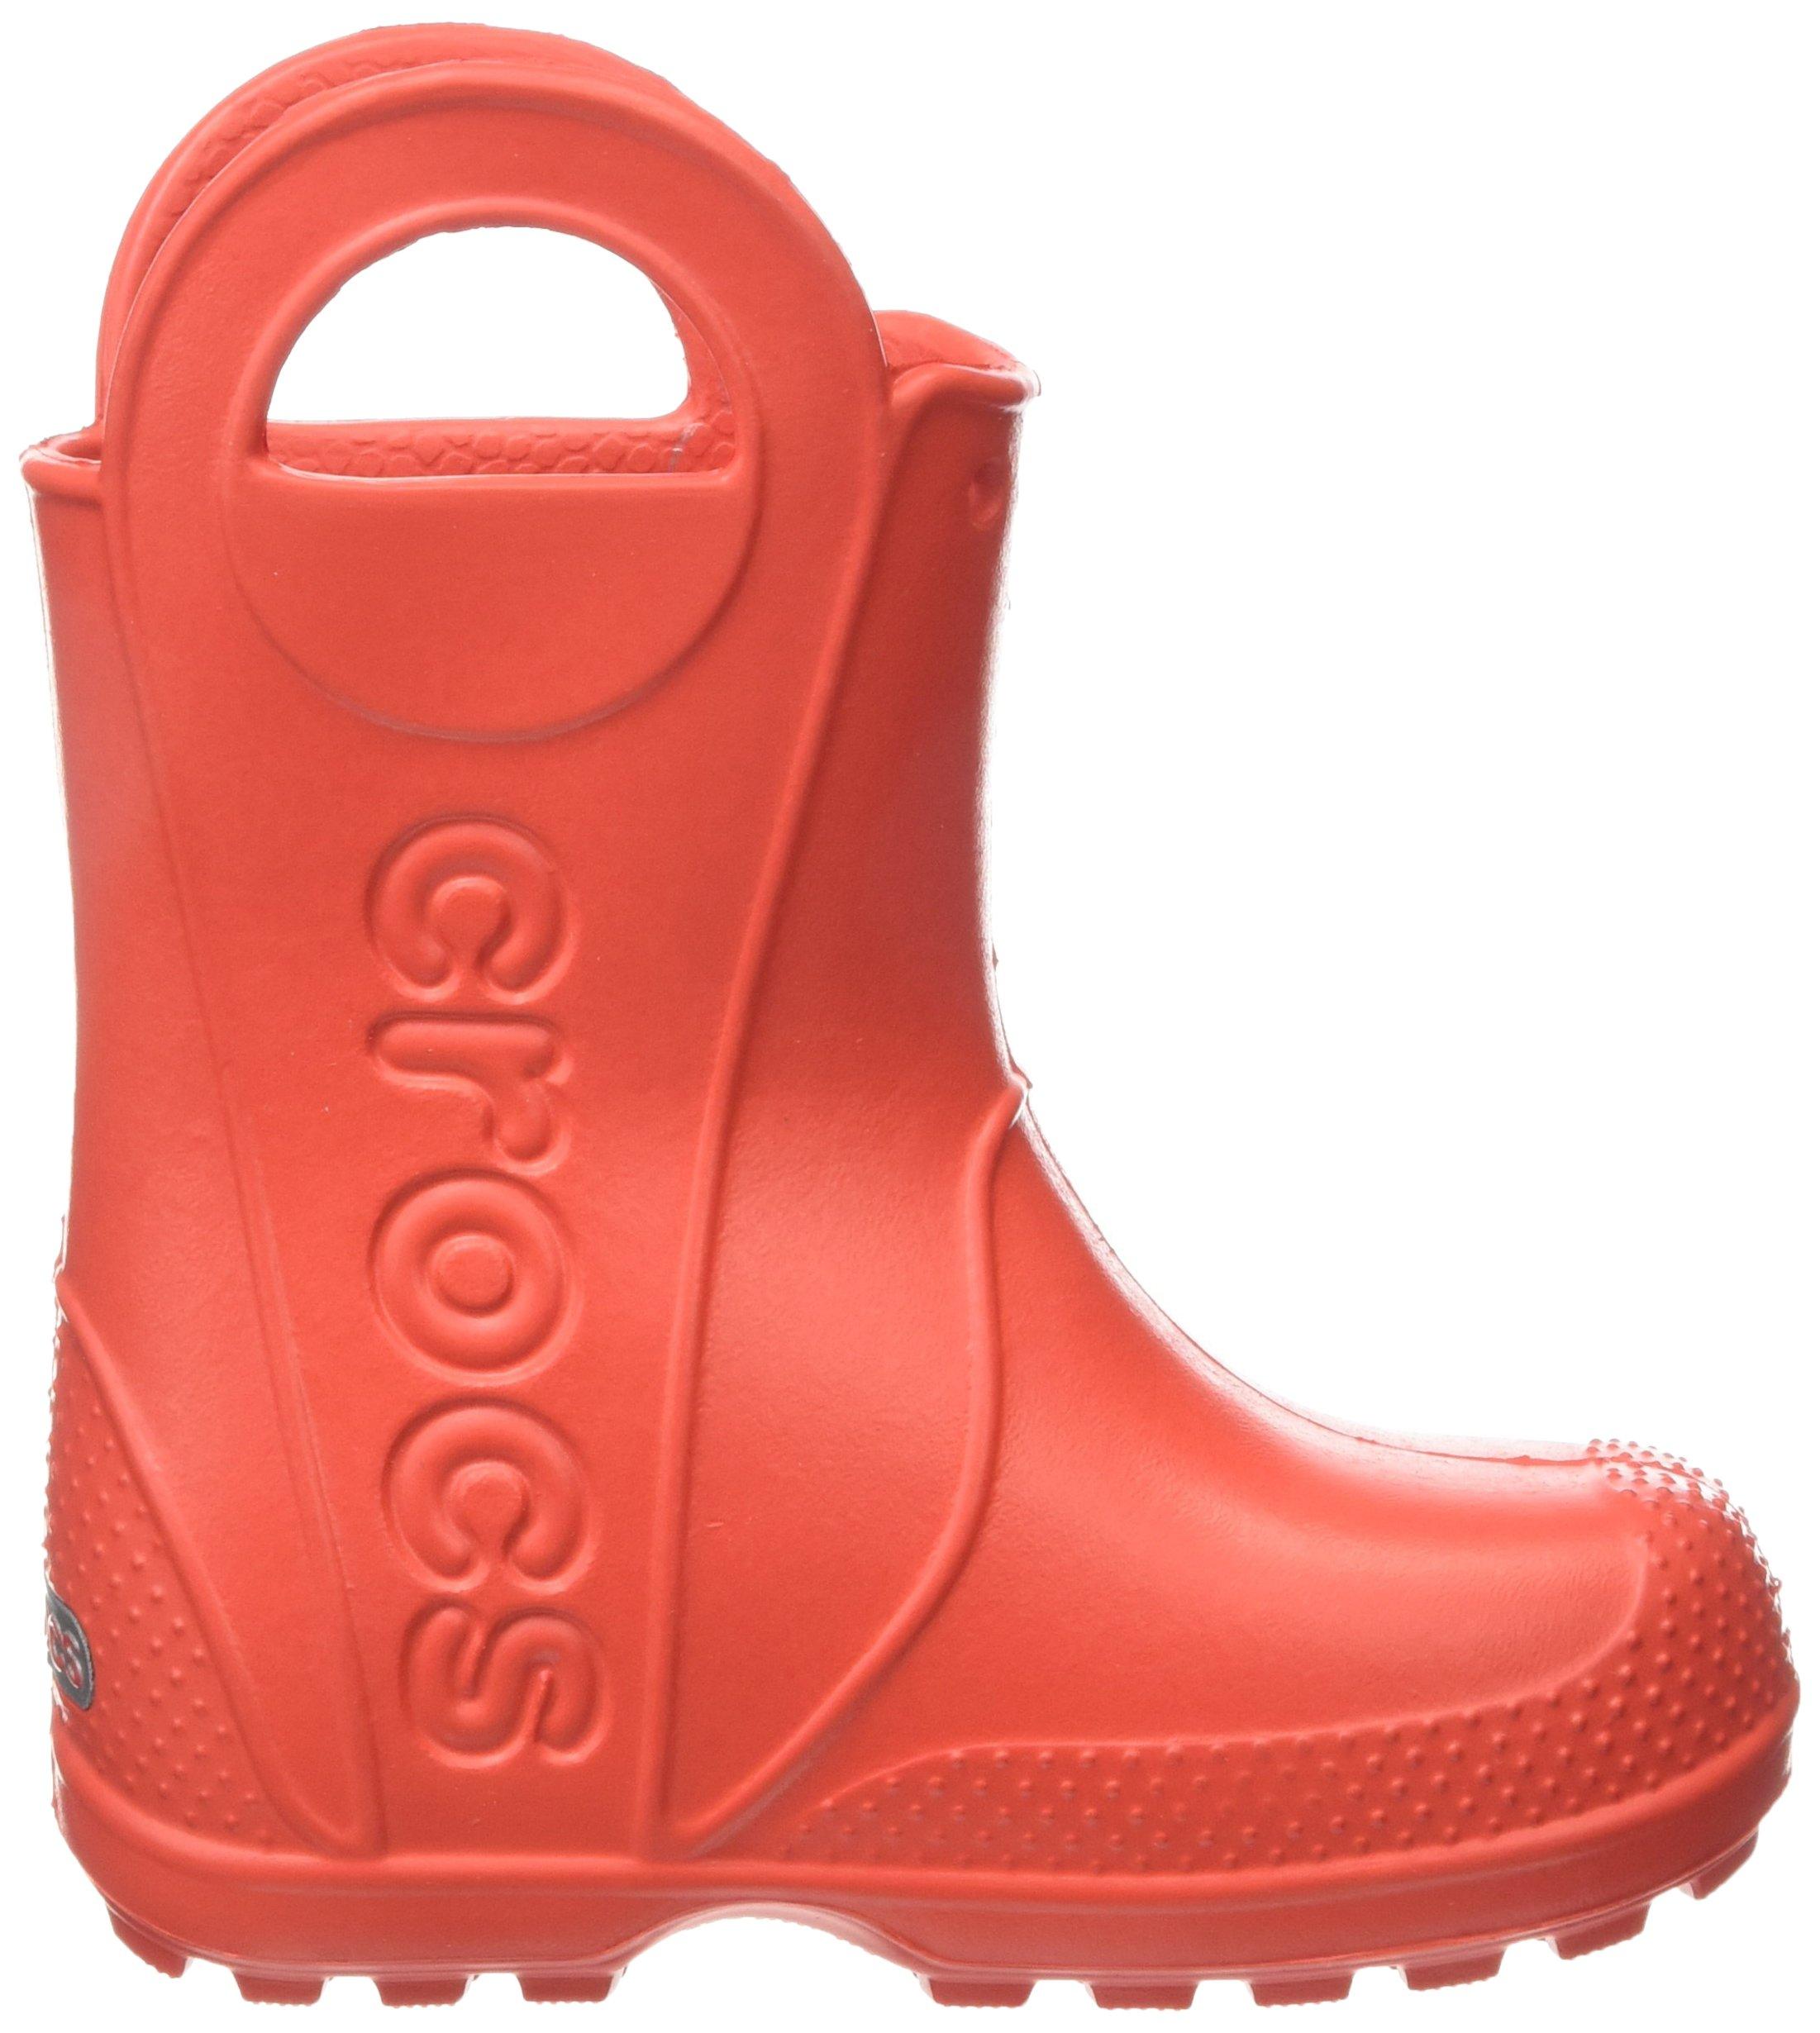 Crocs Kids' Handle It Rain Boot, Flame, 8 M US Toddler by Crocs (Image #7)